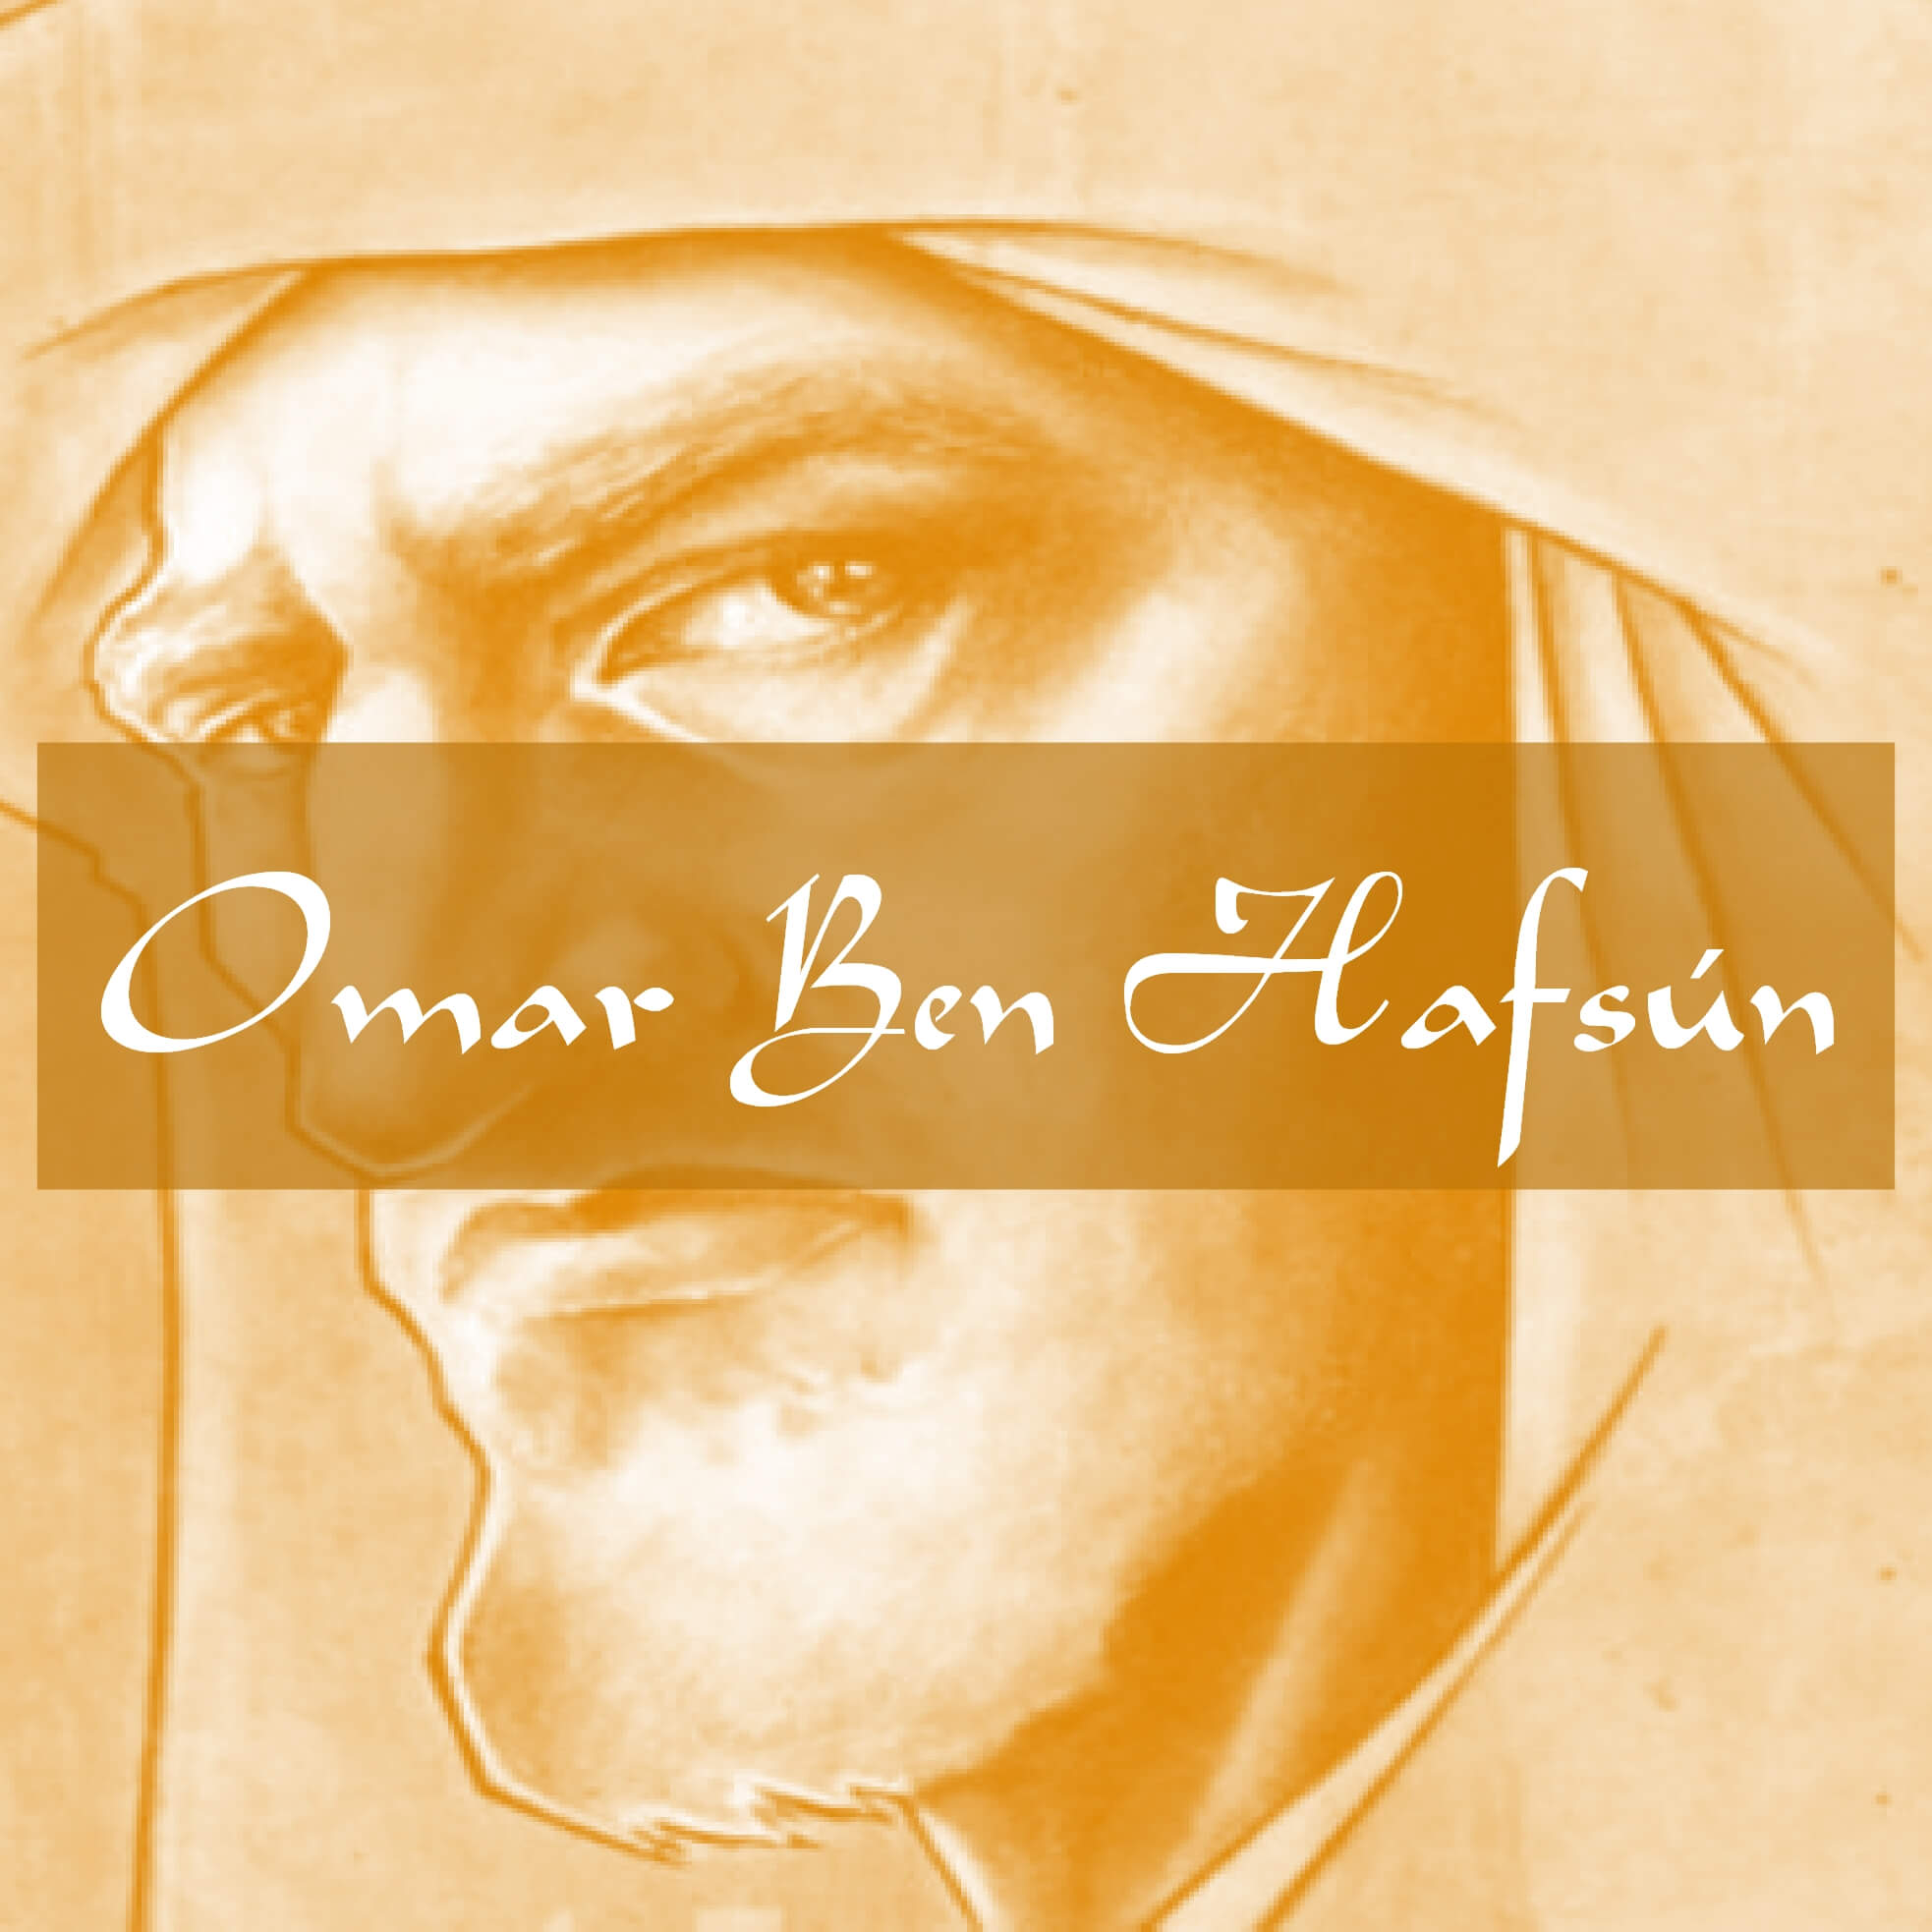 Omar Ben Hafsun Parauta Malaga